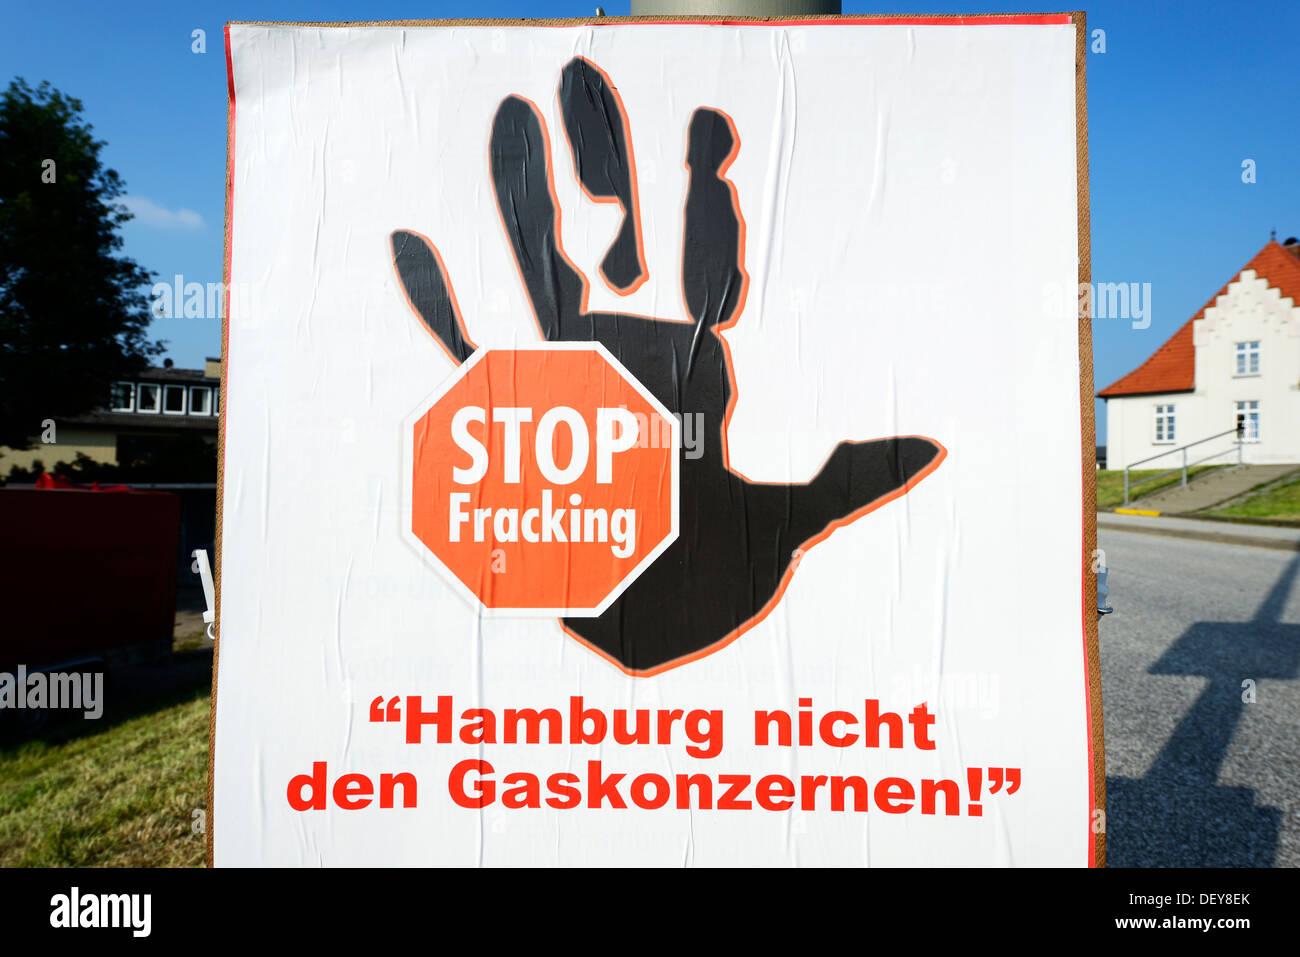 Protest poster against Fracking in the 4 and march landing, Hamburg, Germany, Europe, Protestplakat gegen Fracking - Stock Image